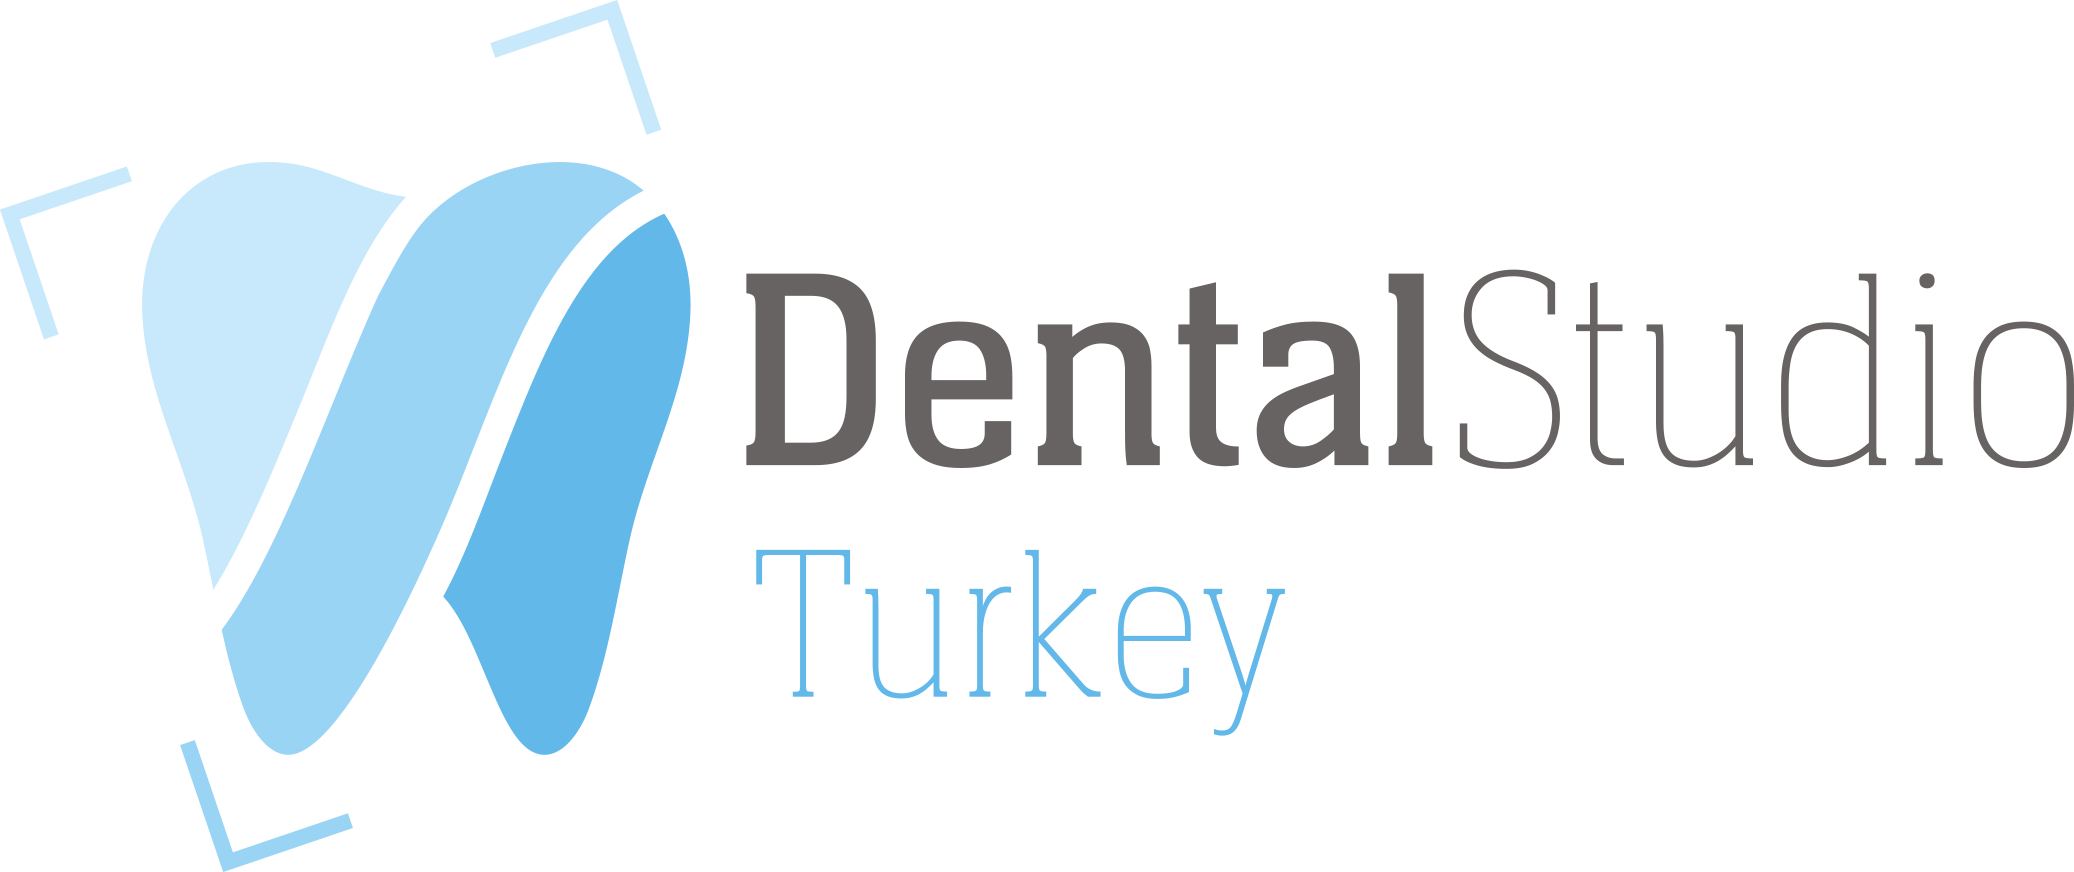 https://dentalstudioturkey.com/wp-content/uploads/2021/03/dentalstudio-logo1.png